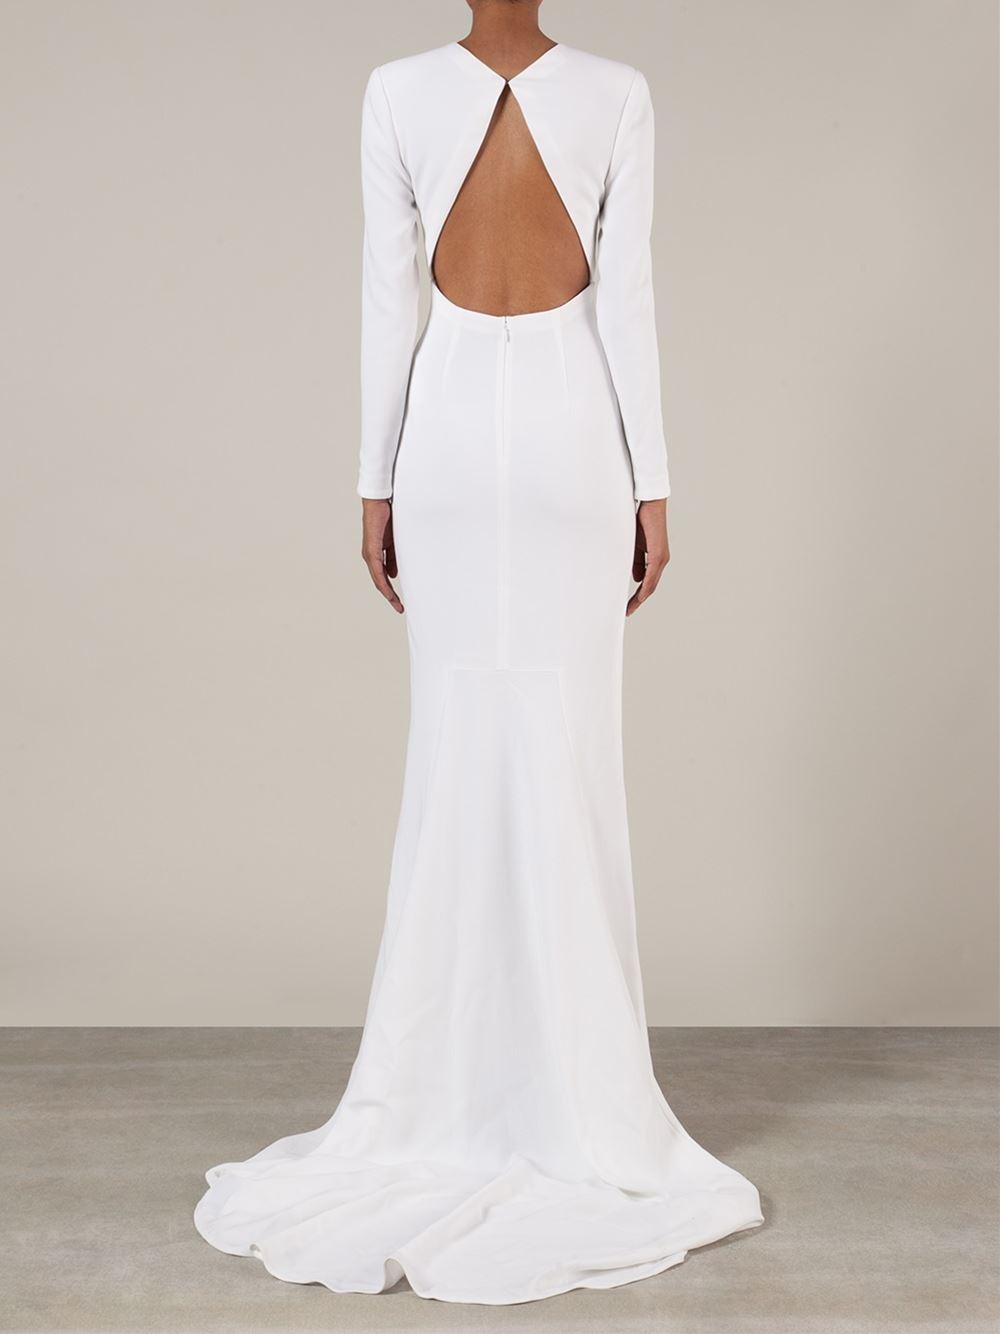 stella mccartney wedding dresses photo - 1